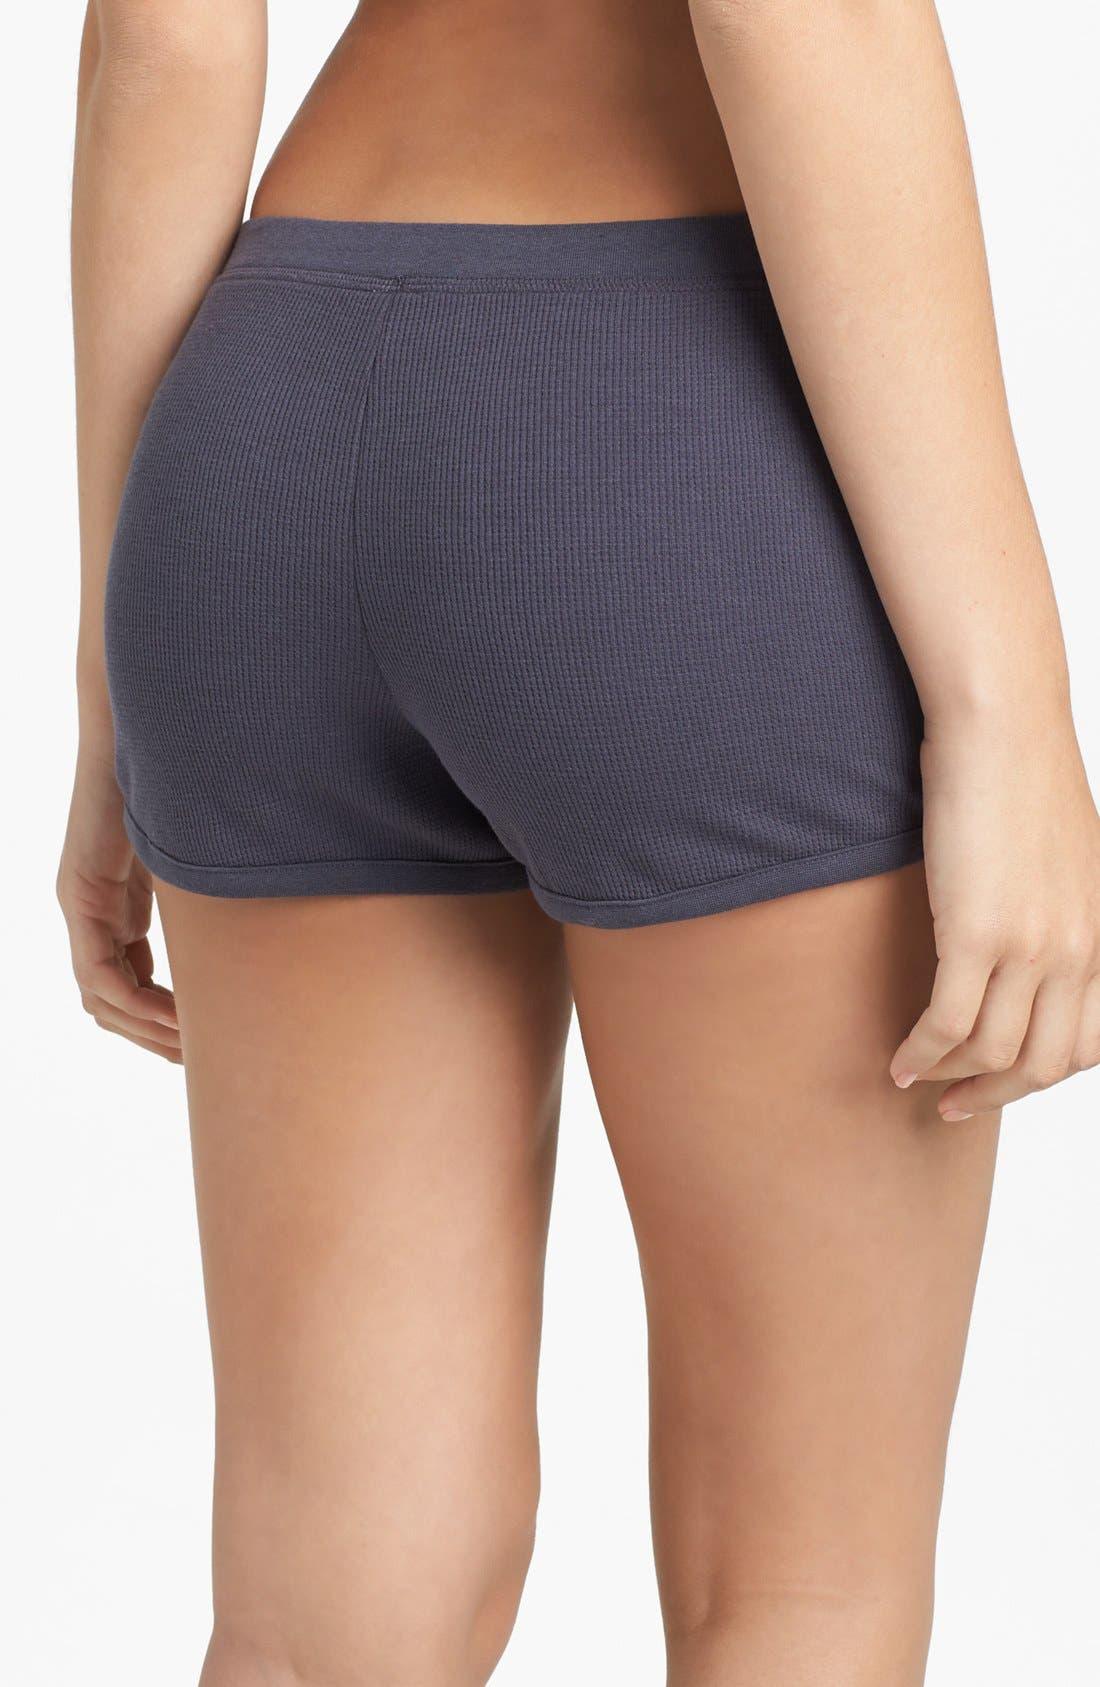 Alternate Image 2  - BP. Undercover 'Campside' Thermal Shorts (Juniors)